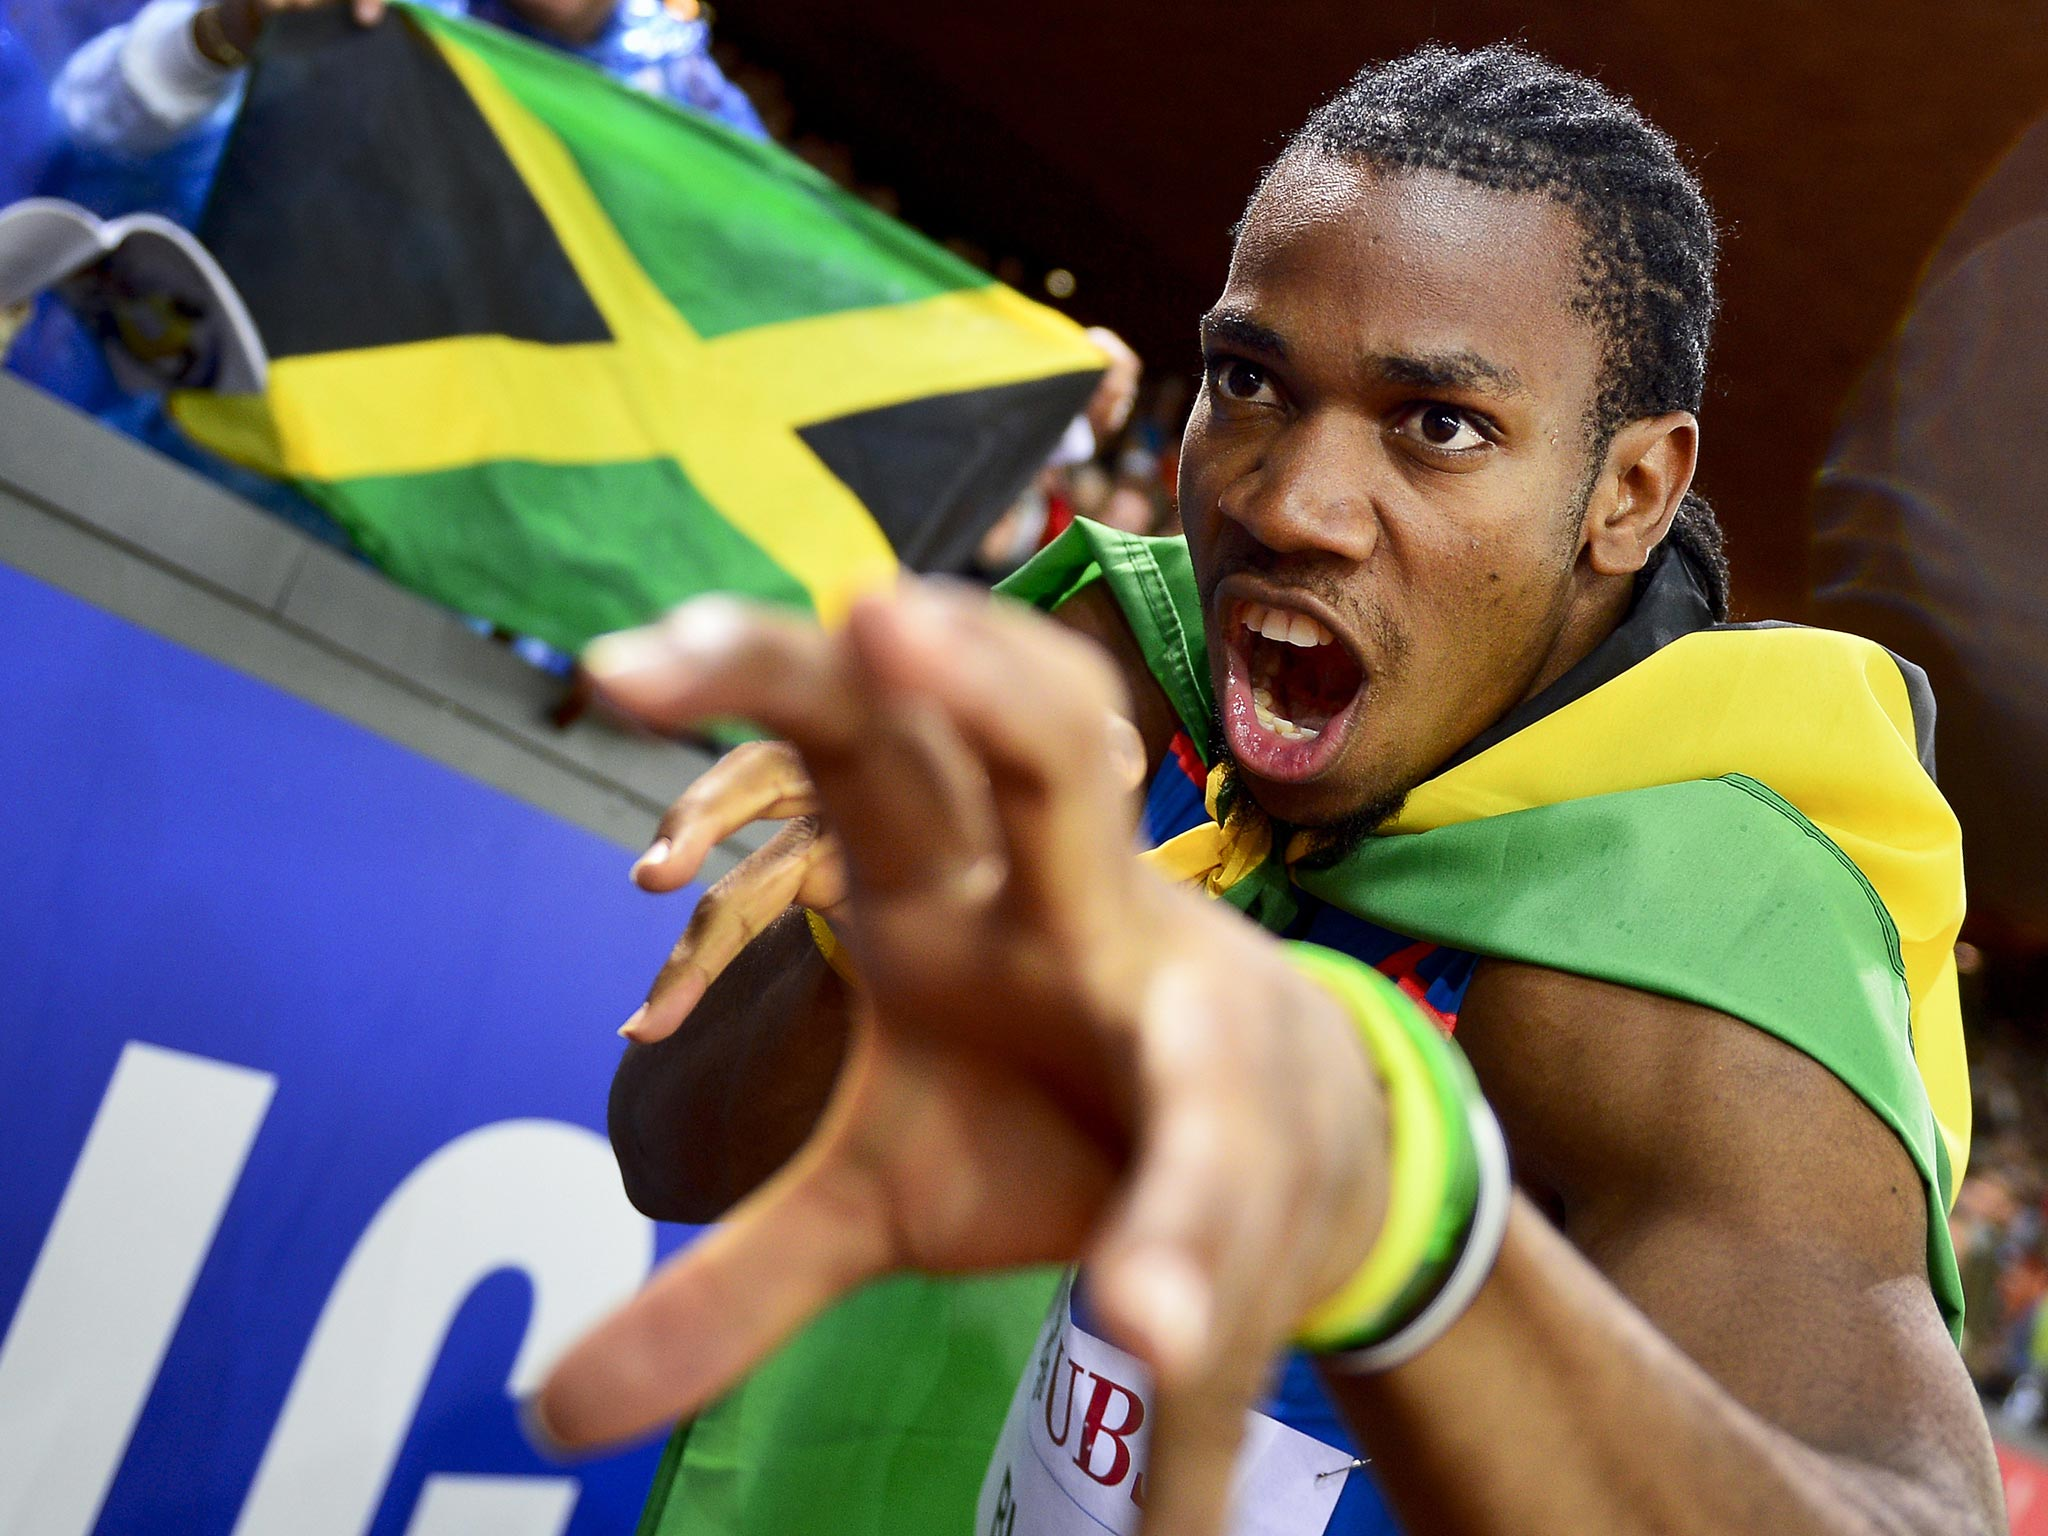 do jamaican sprinters use steroids